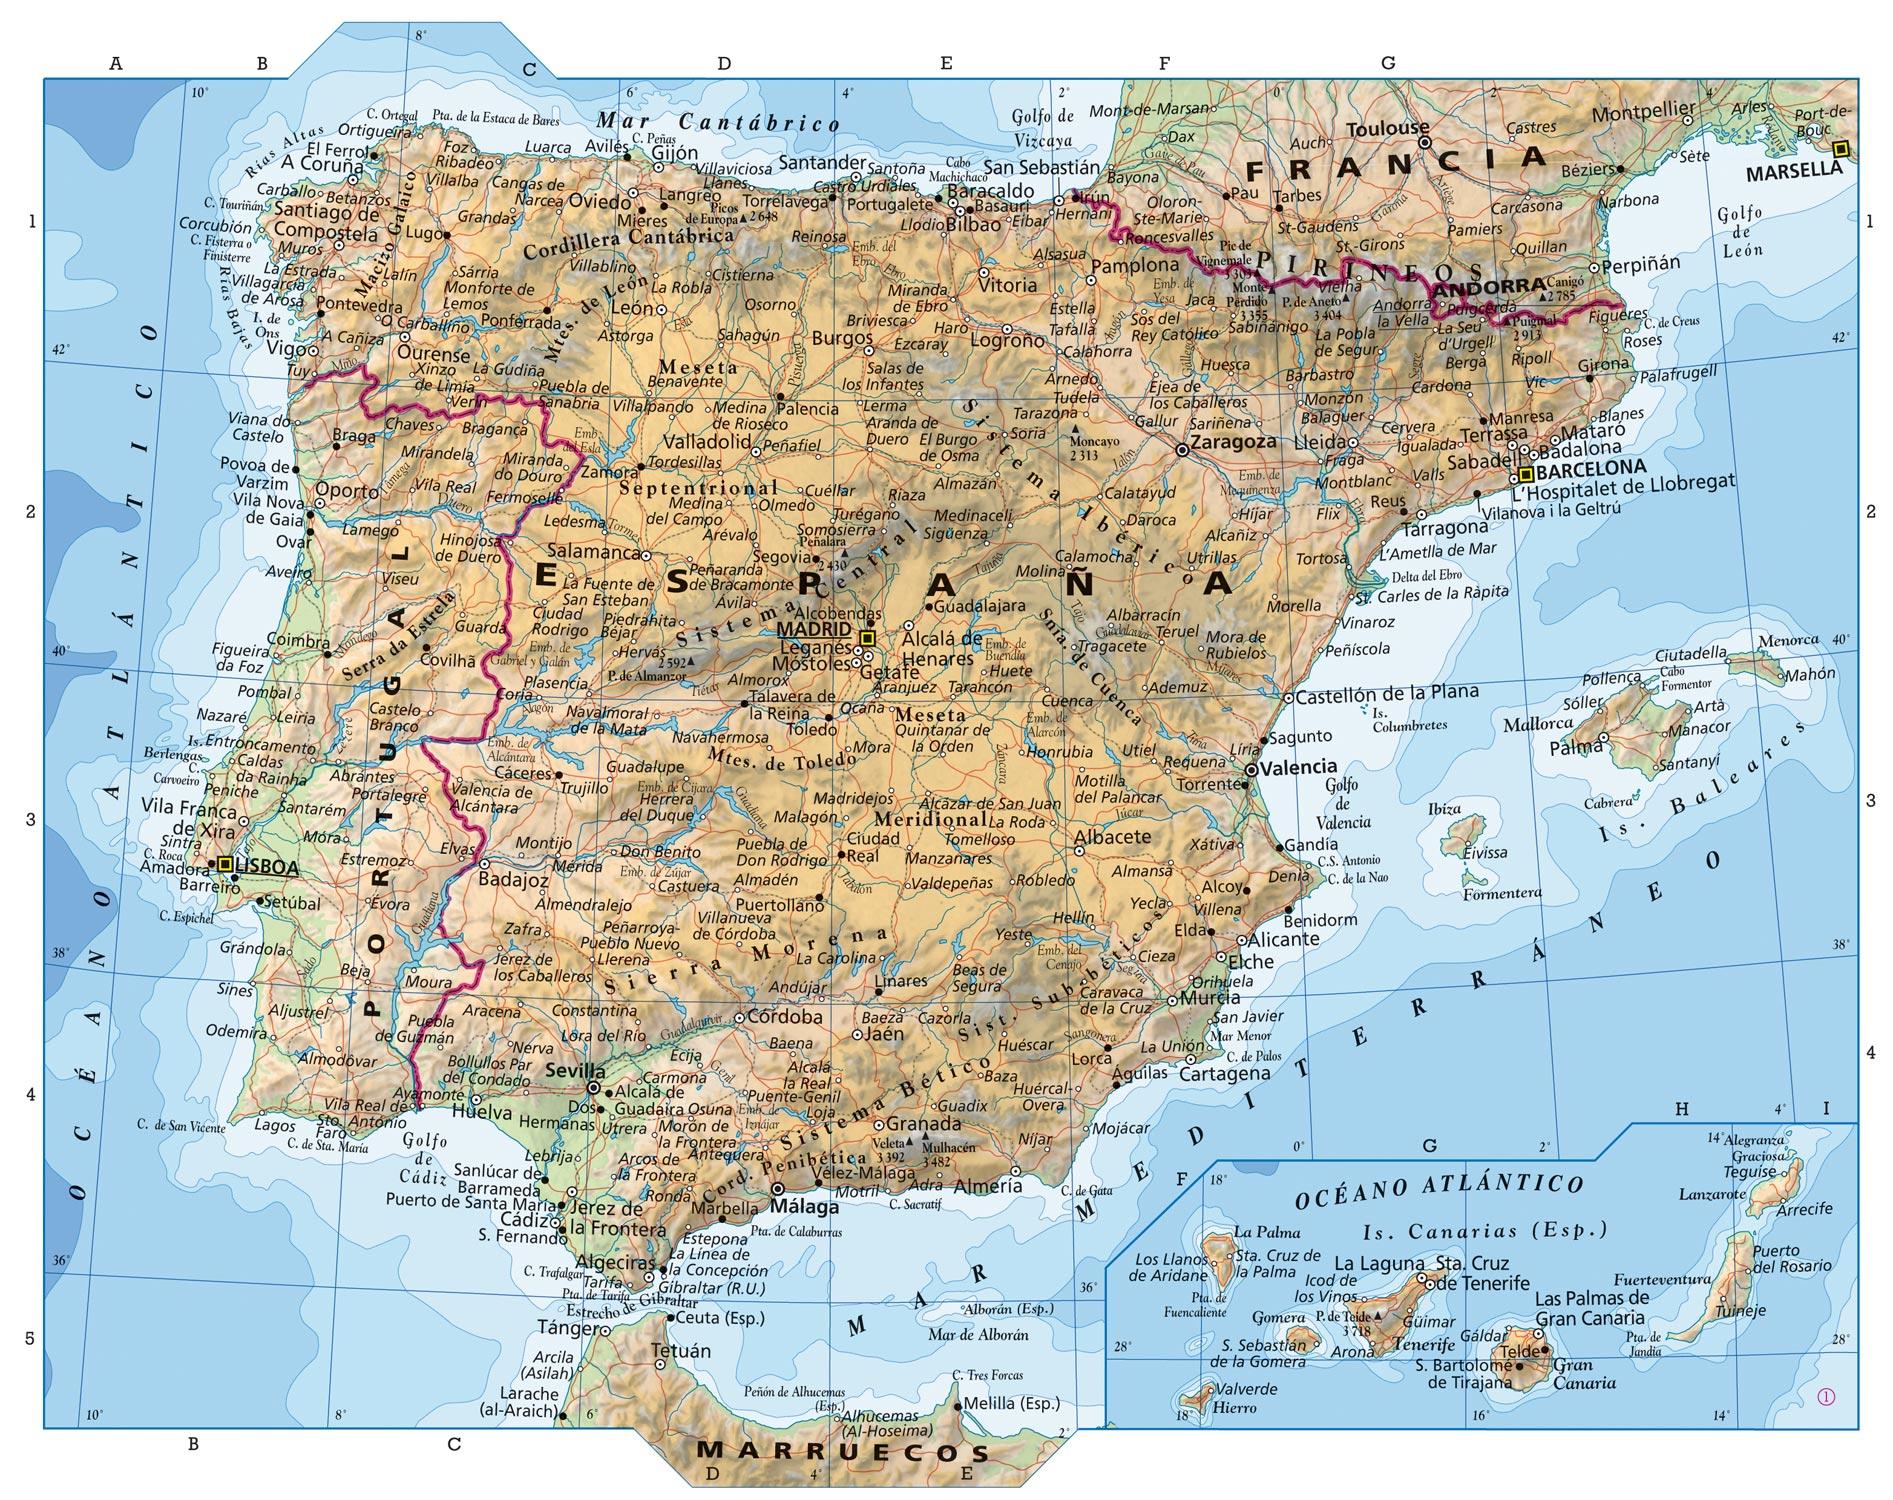 Informaci n financiera informaci n financiera para for Sucursales banco espana